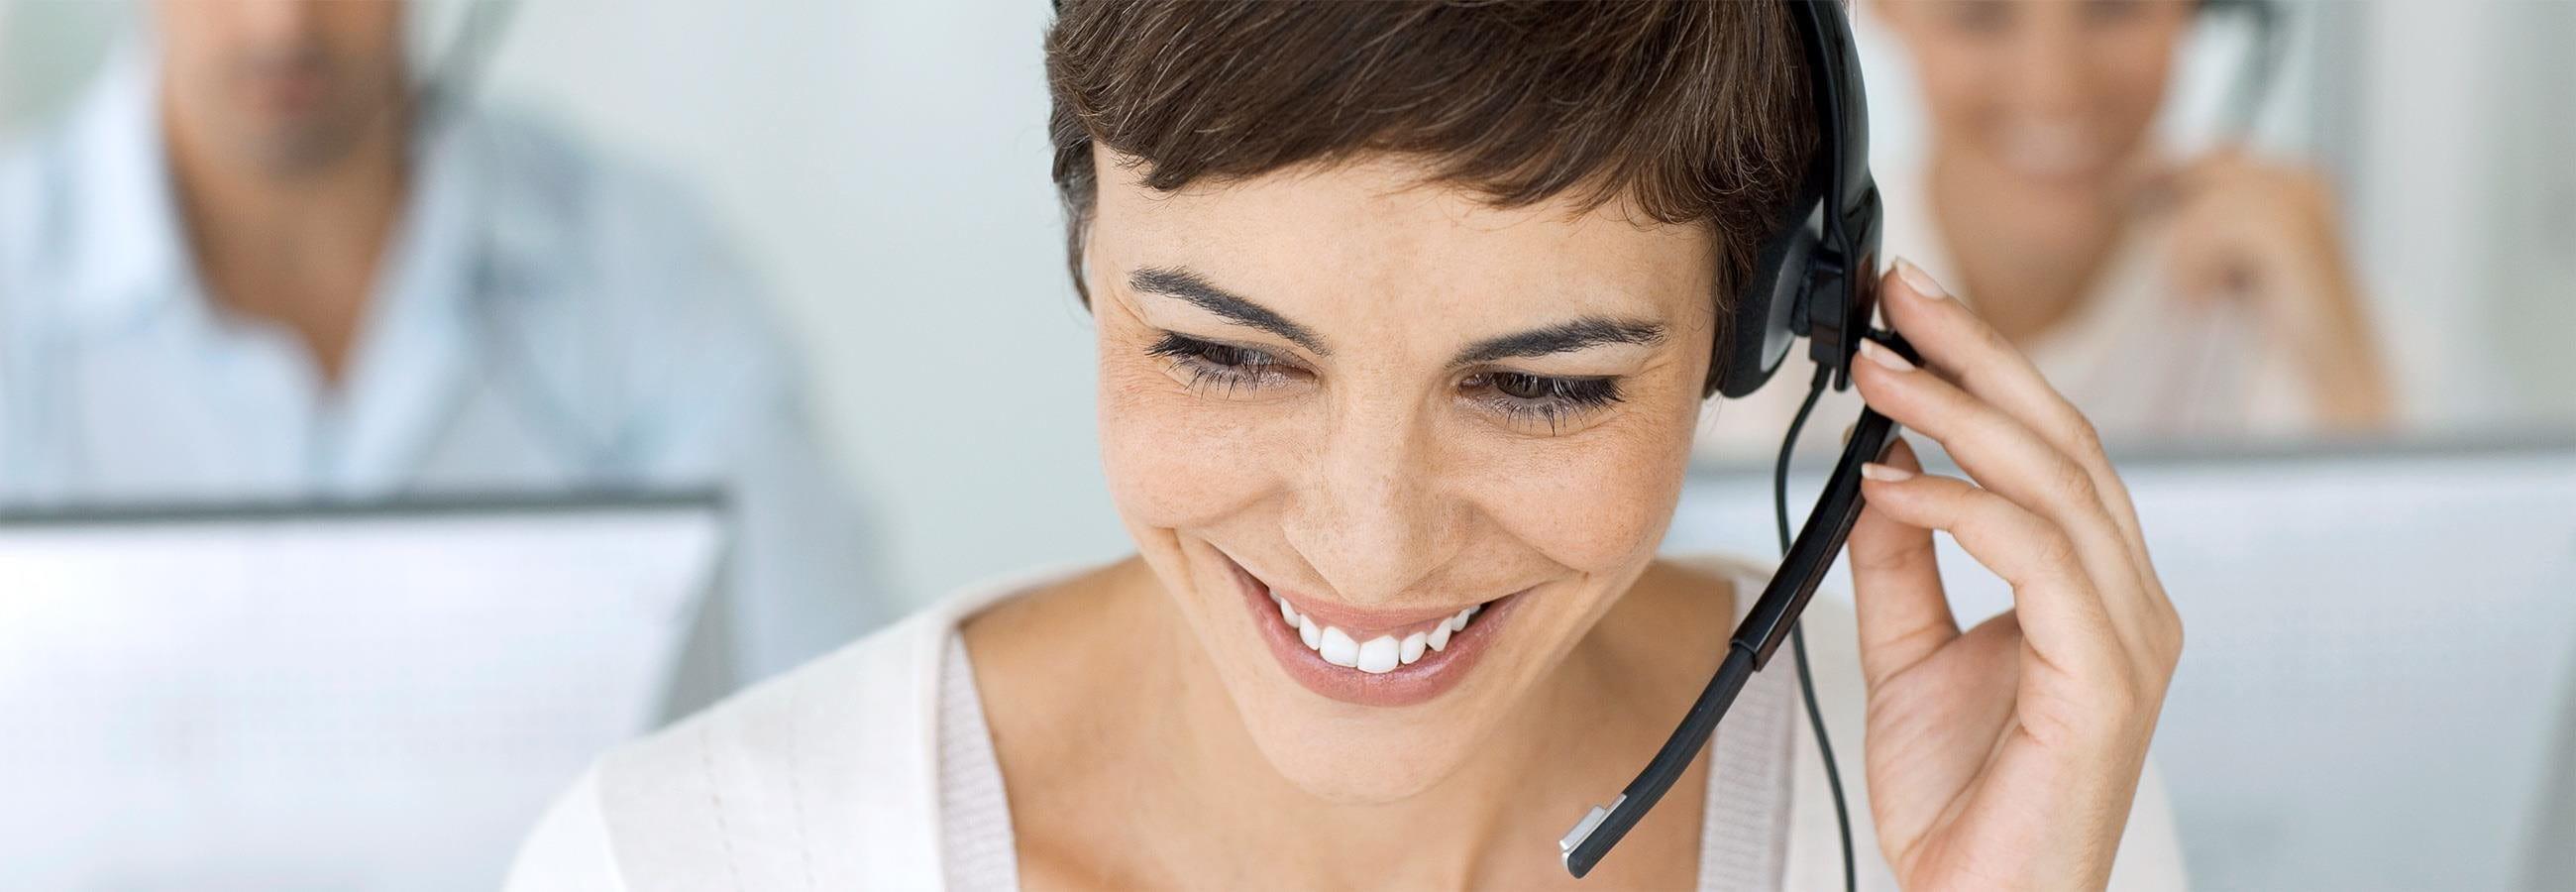 Femme avec un headset.